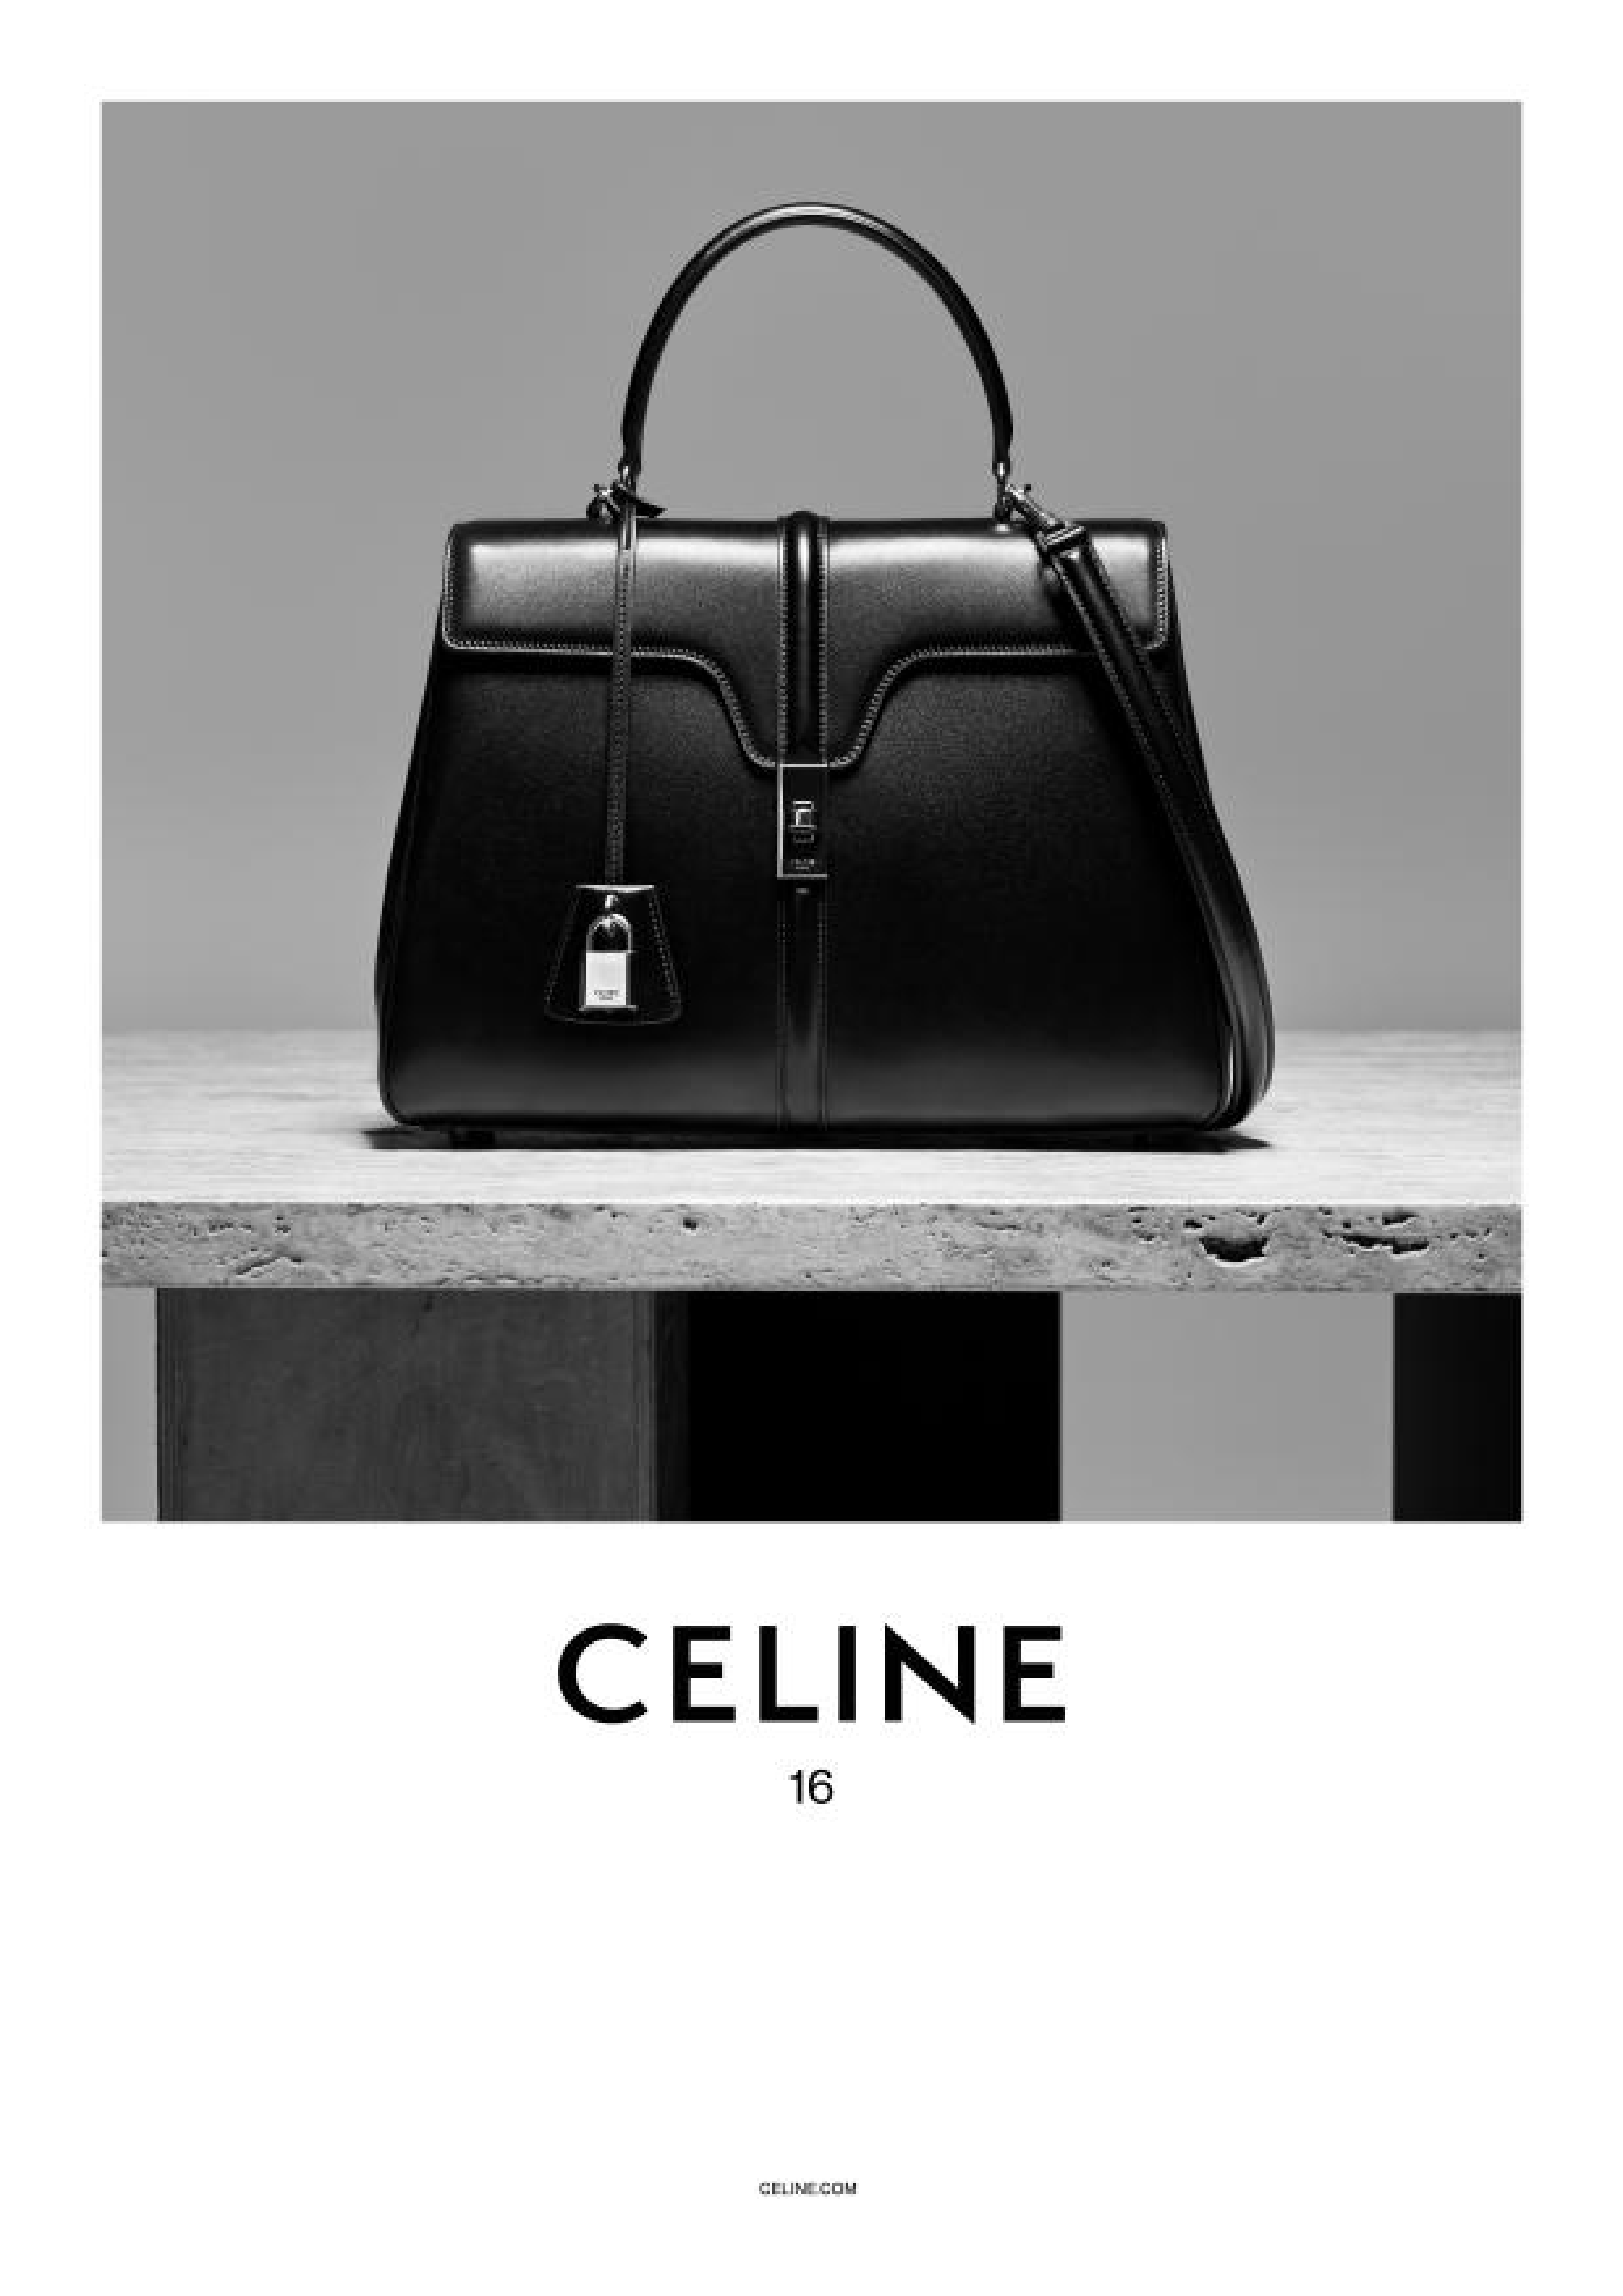 b952f3ba9c Hedi Slimane s Celine handbag is already looking like fall s